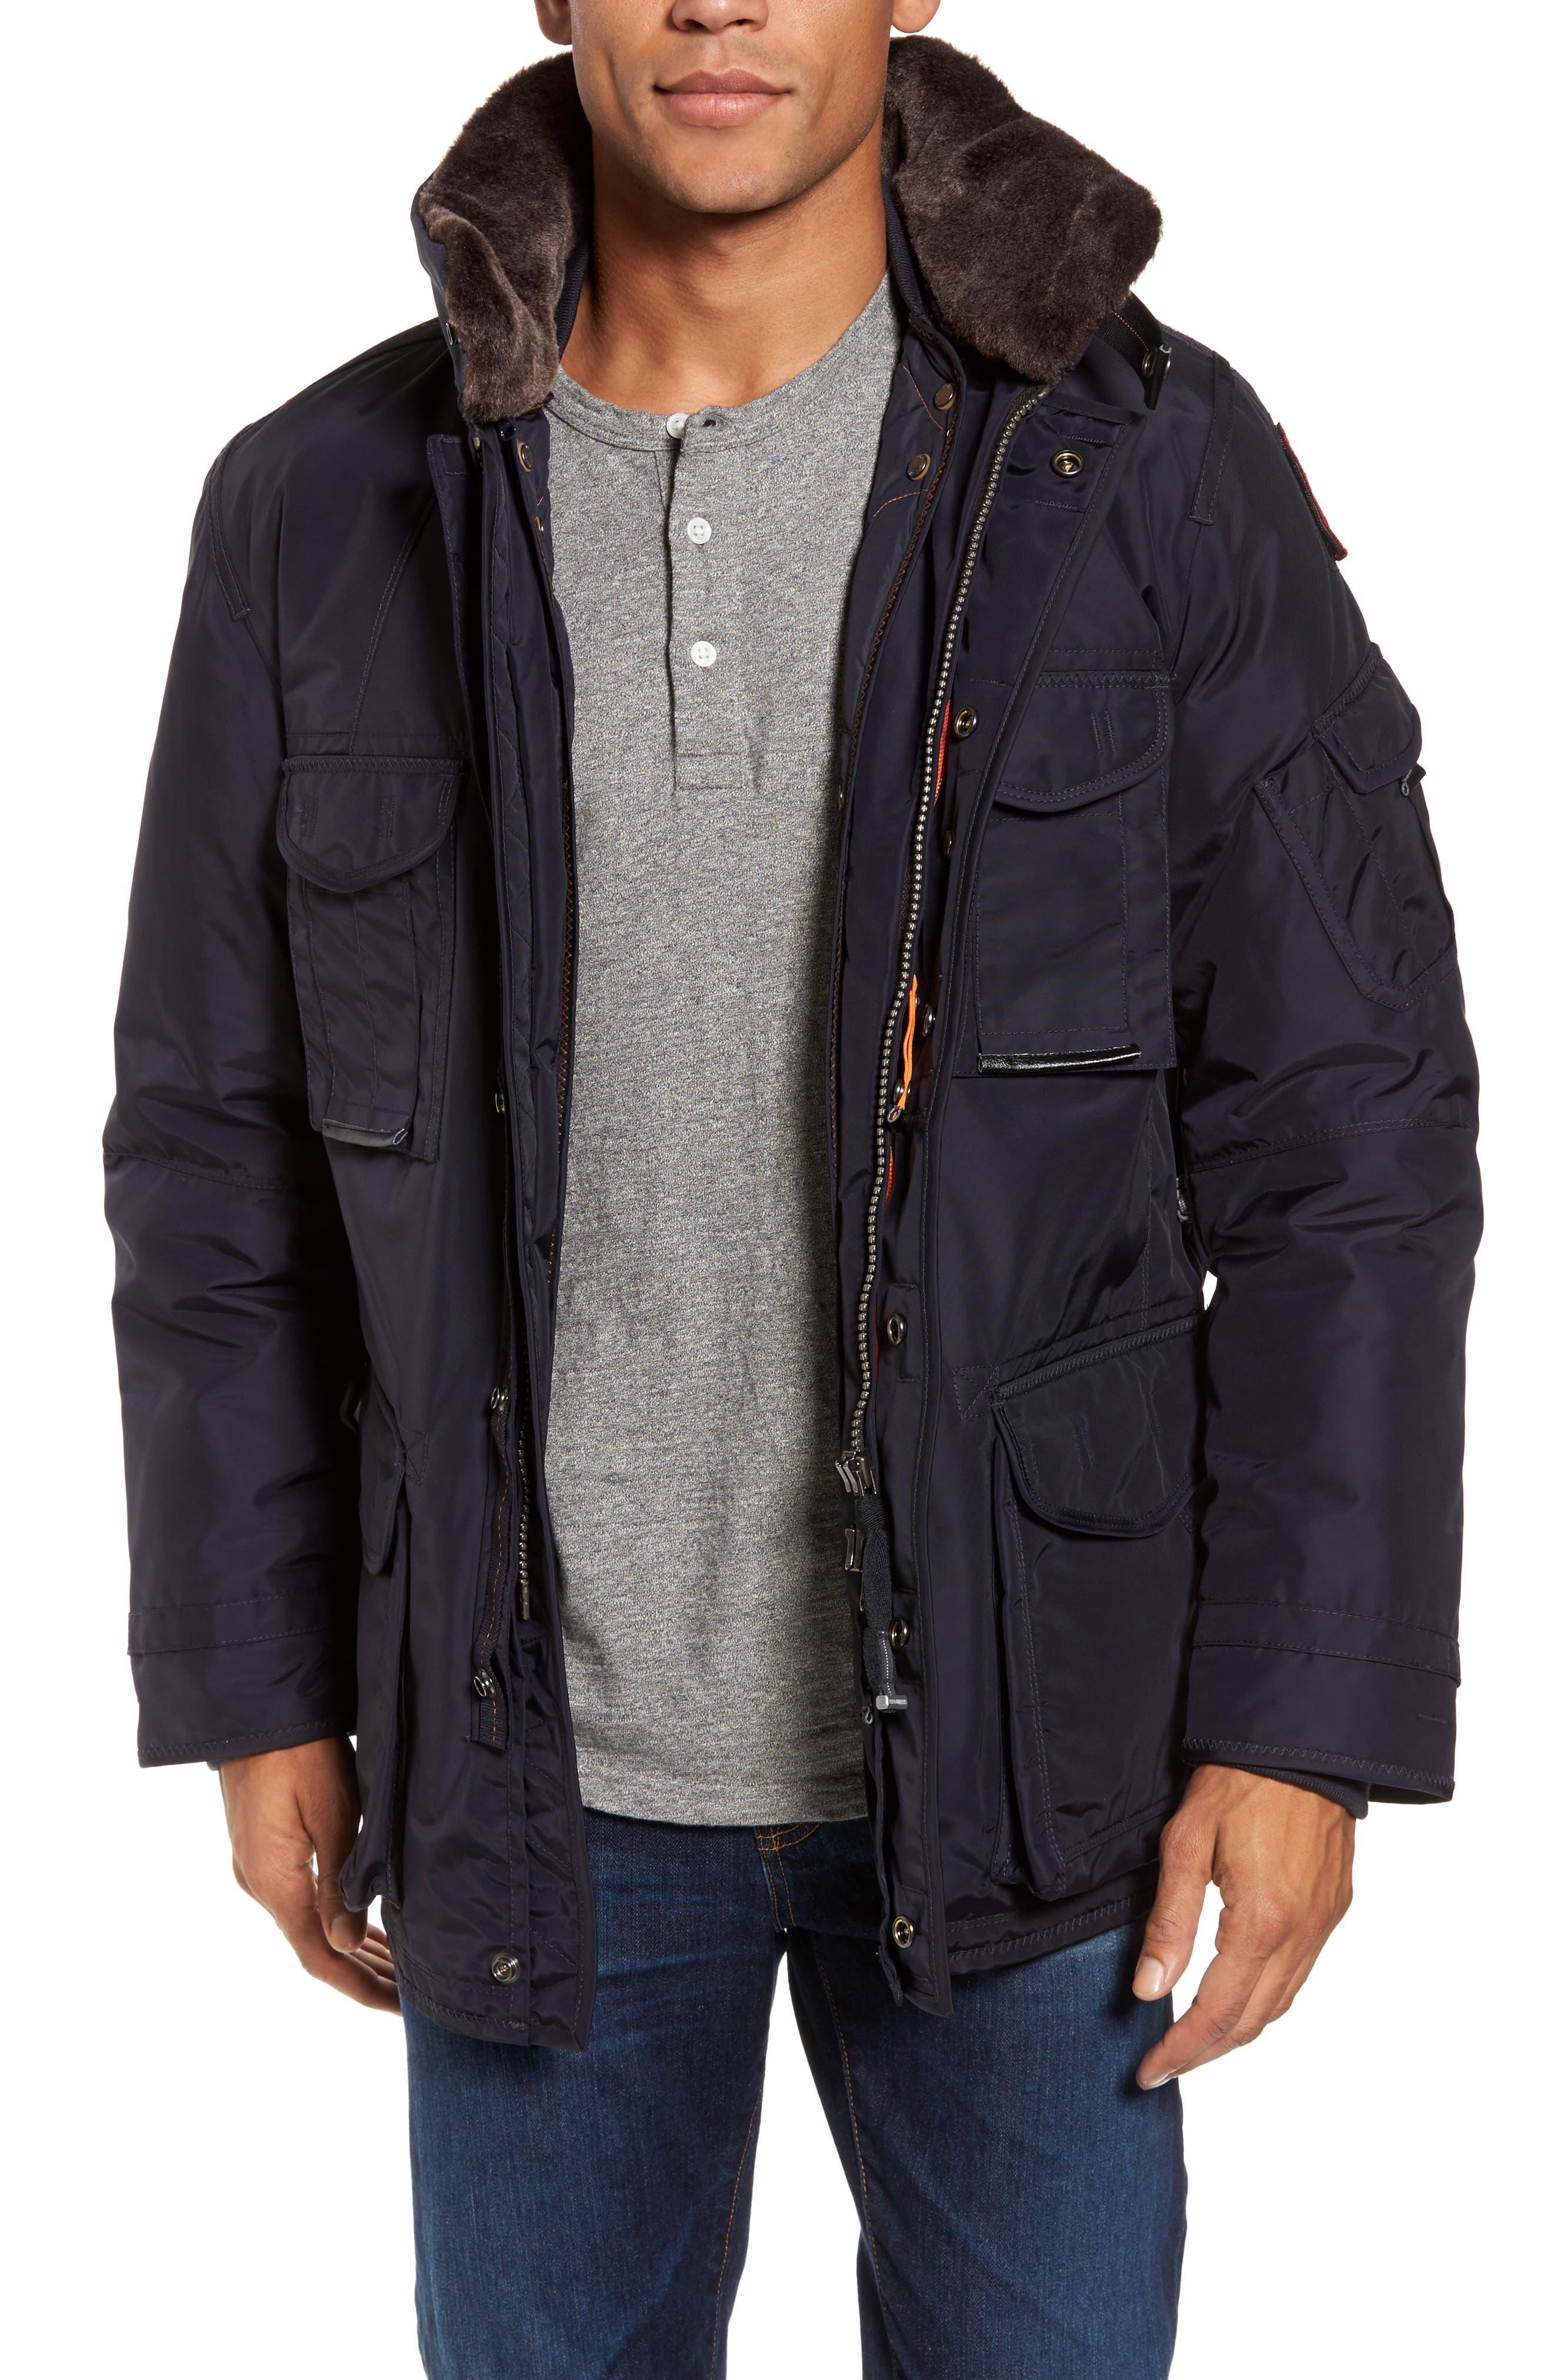 Parajumpers Slim Fit Field Jacket